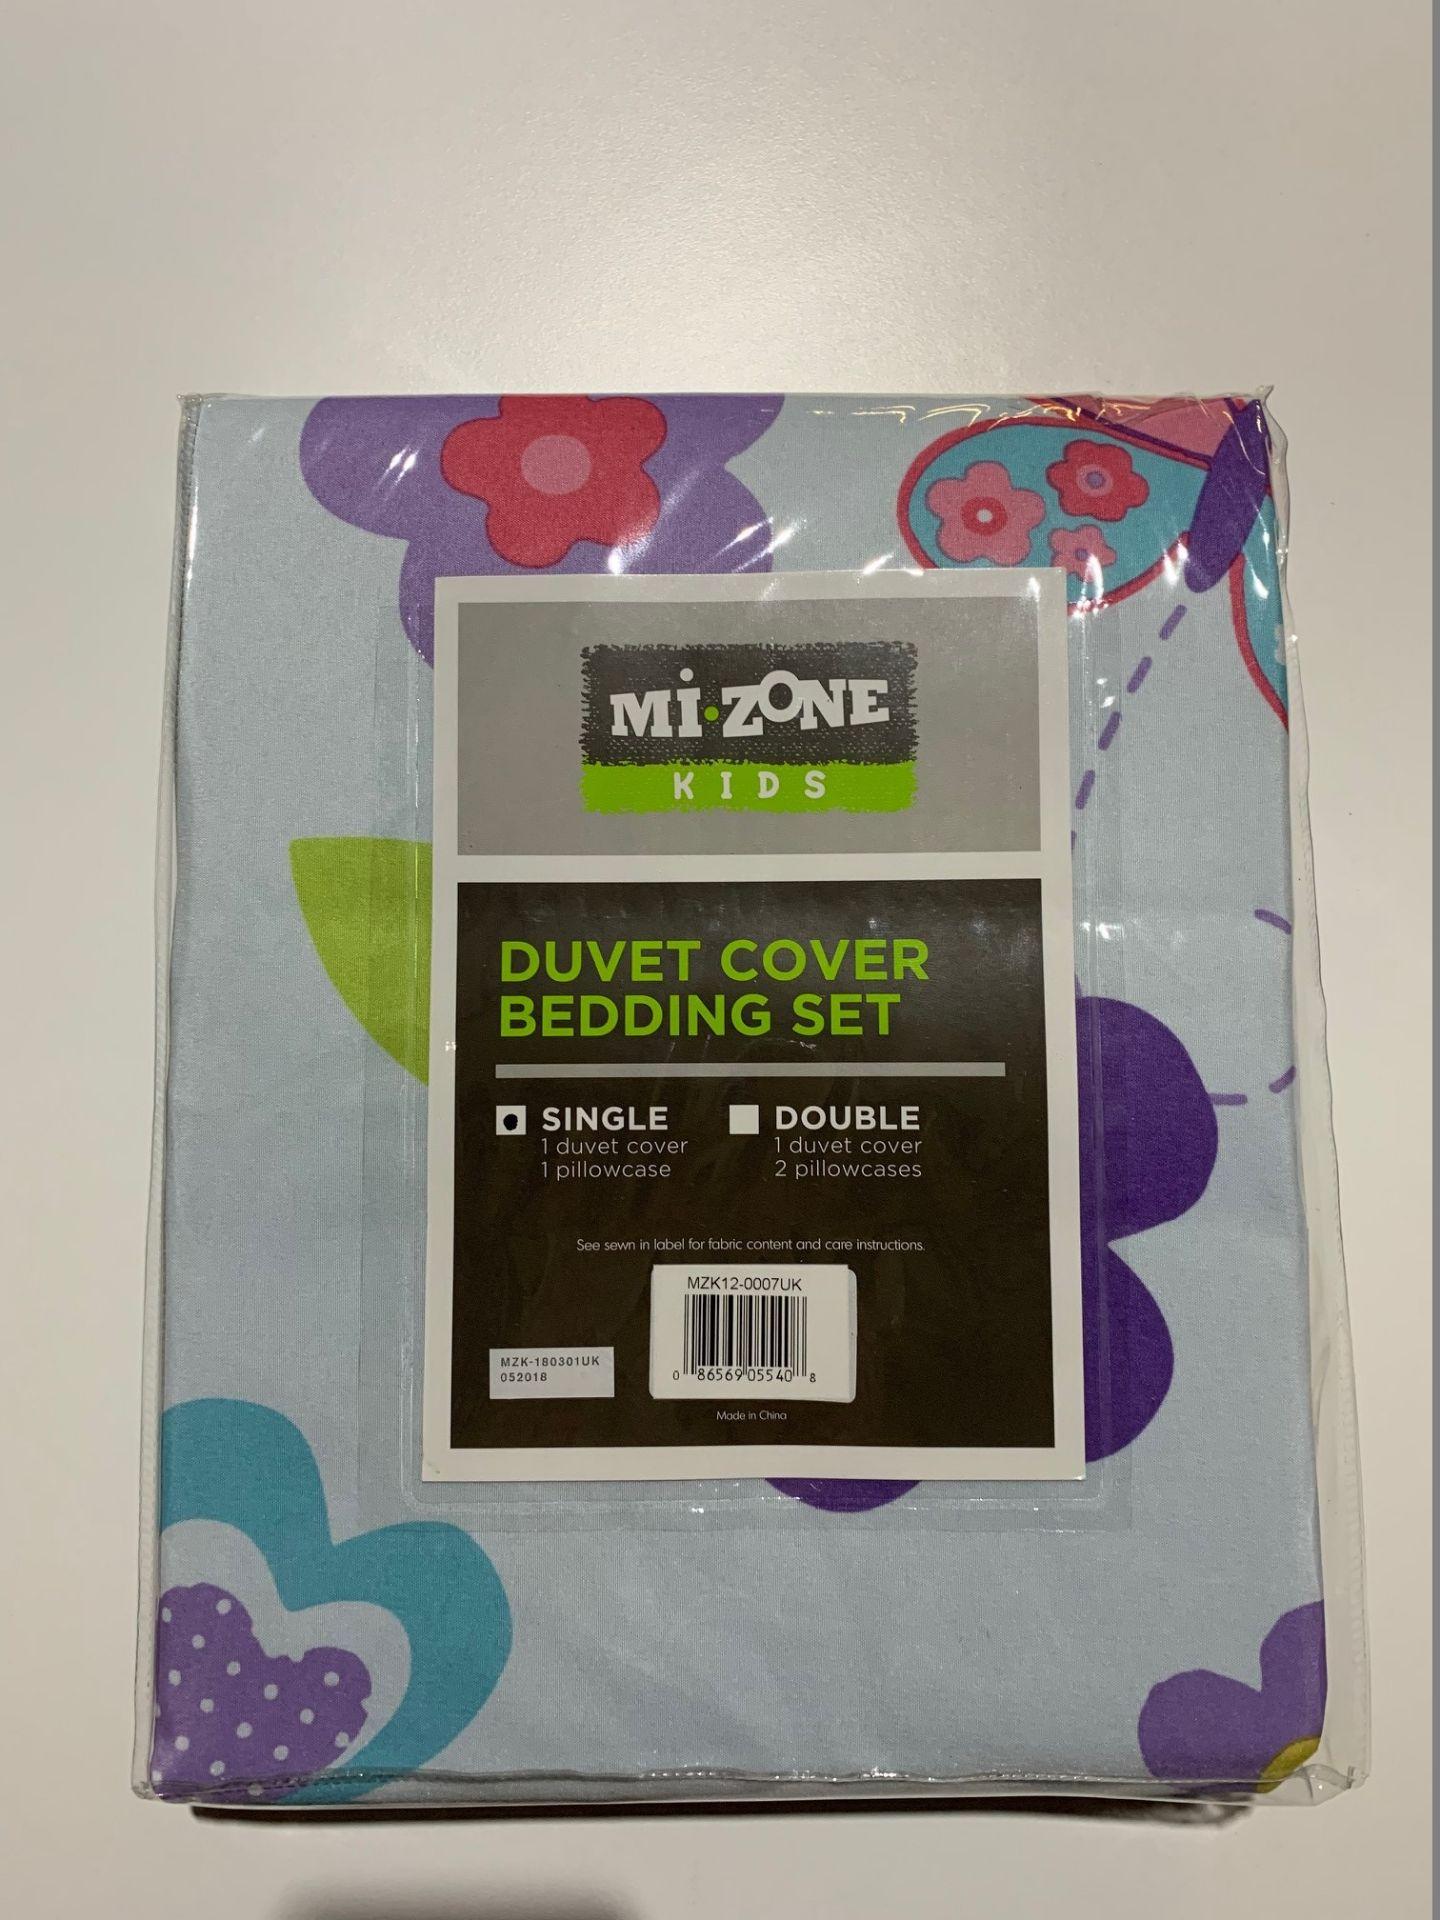 Lot 80 - 1 x Mi-Zone Fluttering Farrah Single Duvet Set - Product Code MZ12-0007UK (Brand New - RRP £21.99)